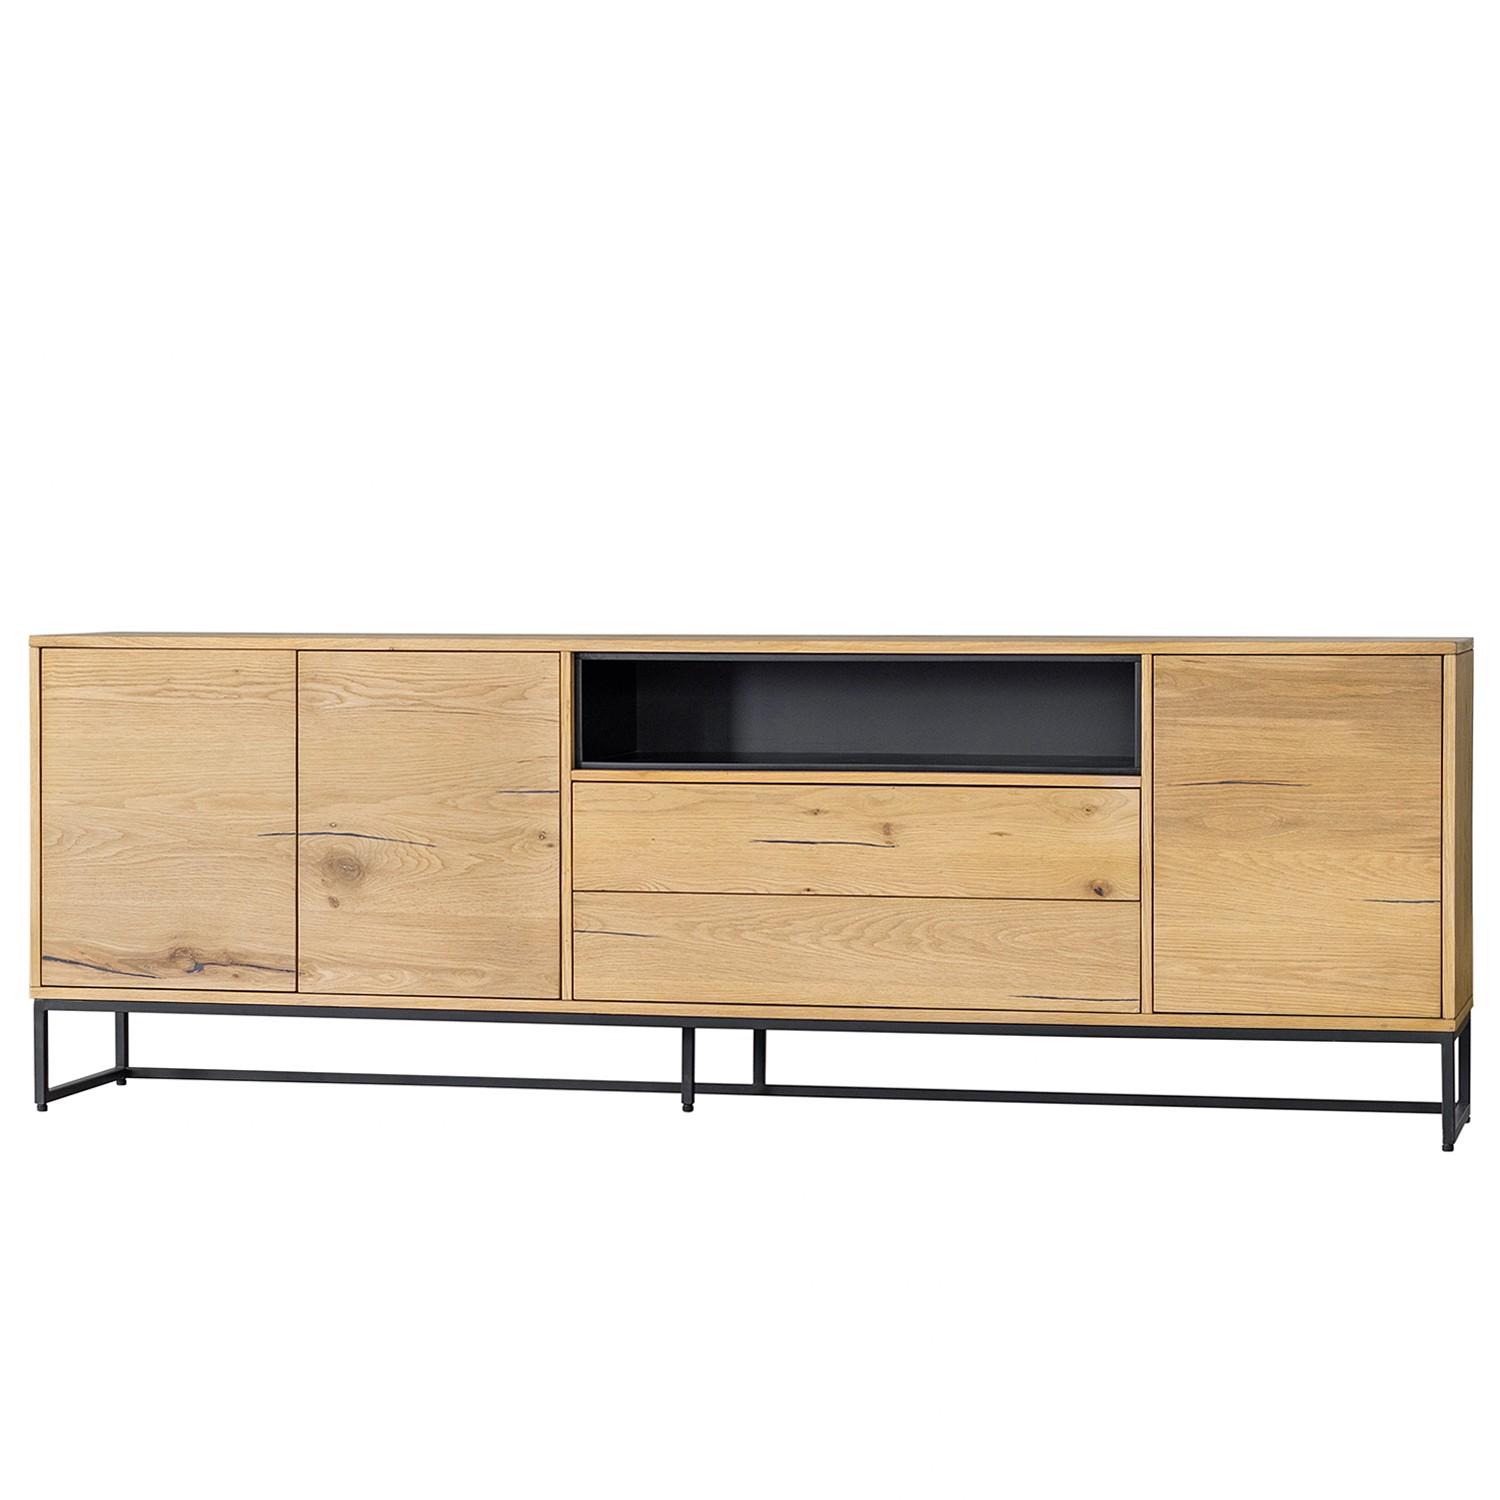 home24 Sideboard Flox II